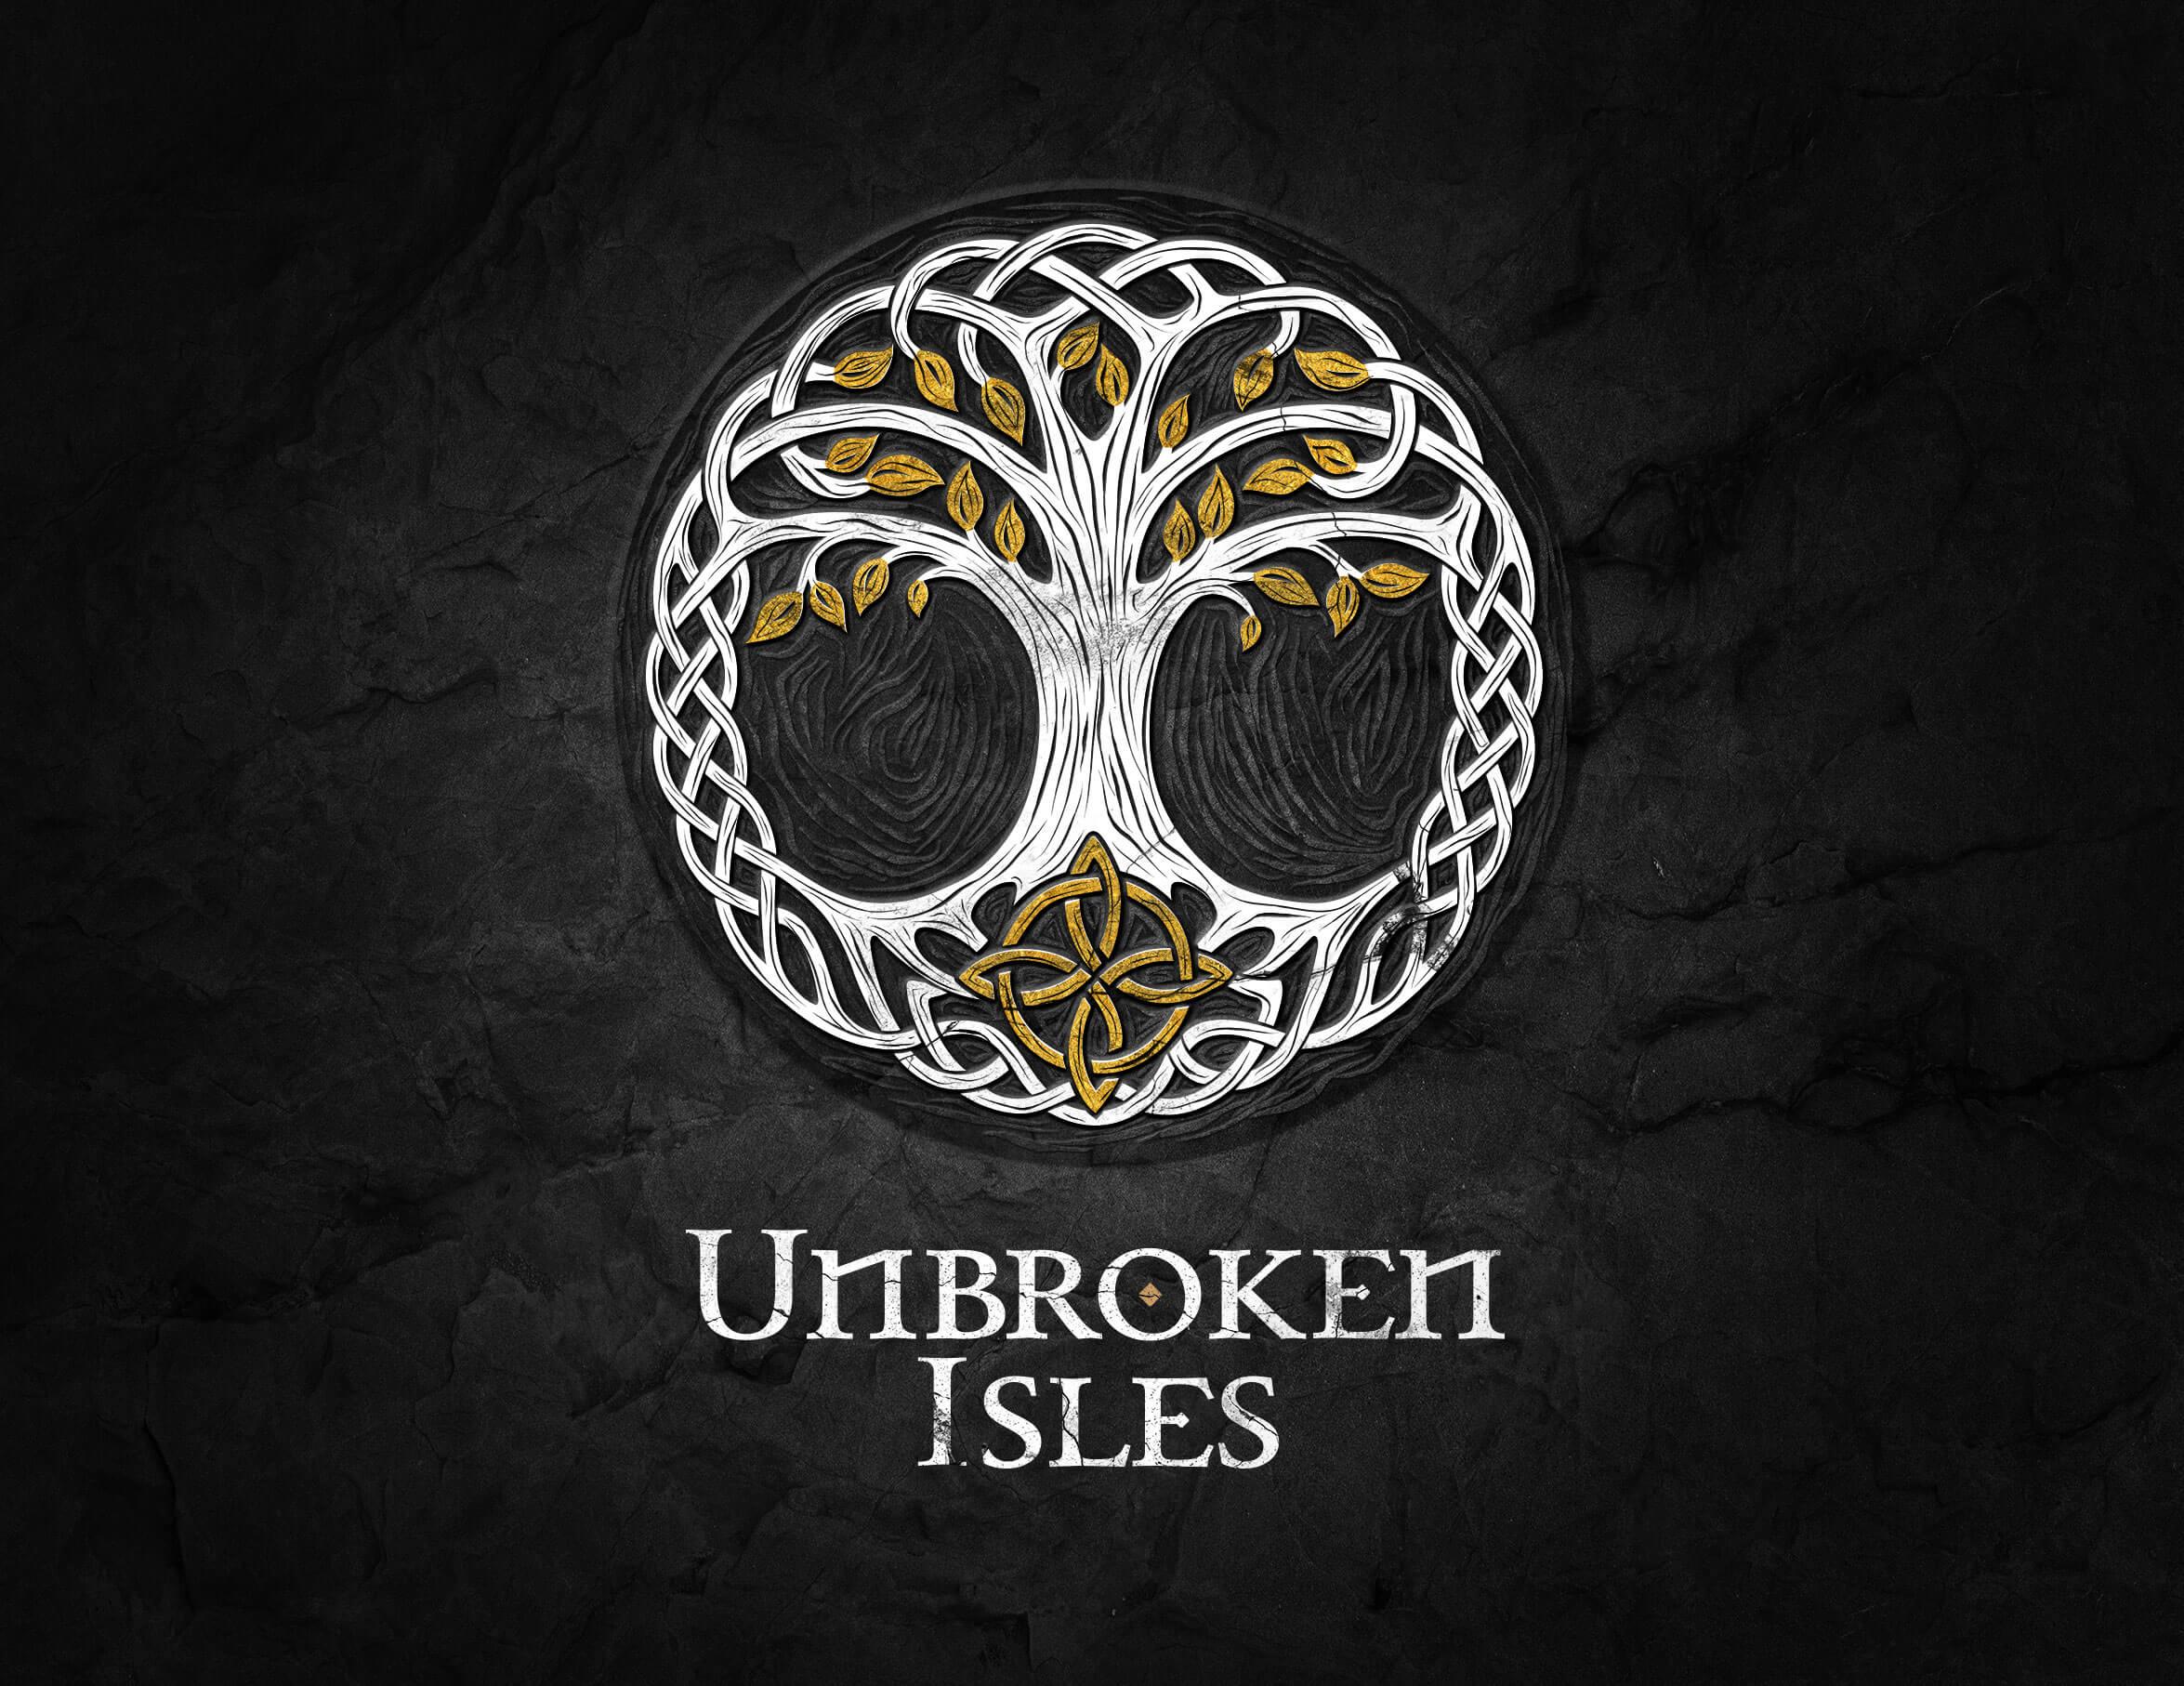 unbroken-isles-new-forest-film-co-2350x1814.jpg